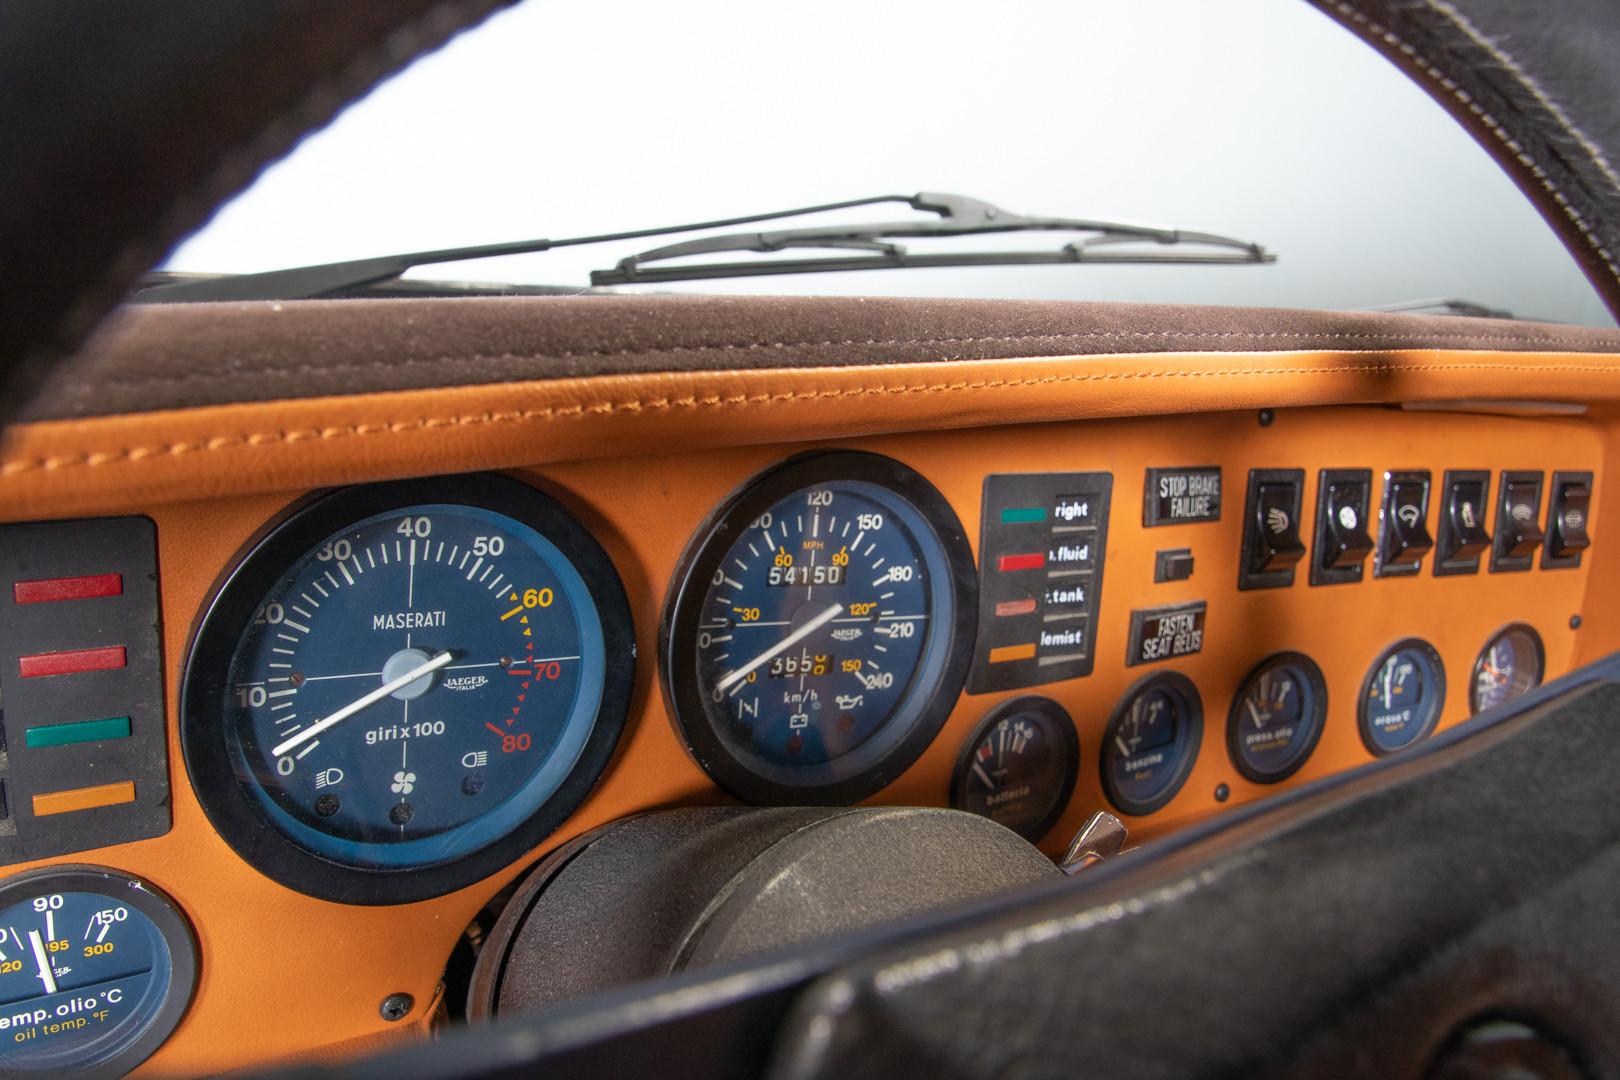 1980 Maserati Kyalami 4.9 - Best sales - Ruote da Sogno